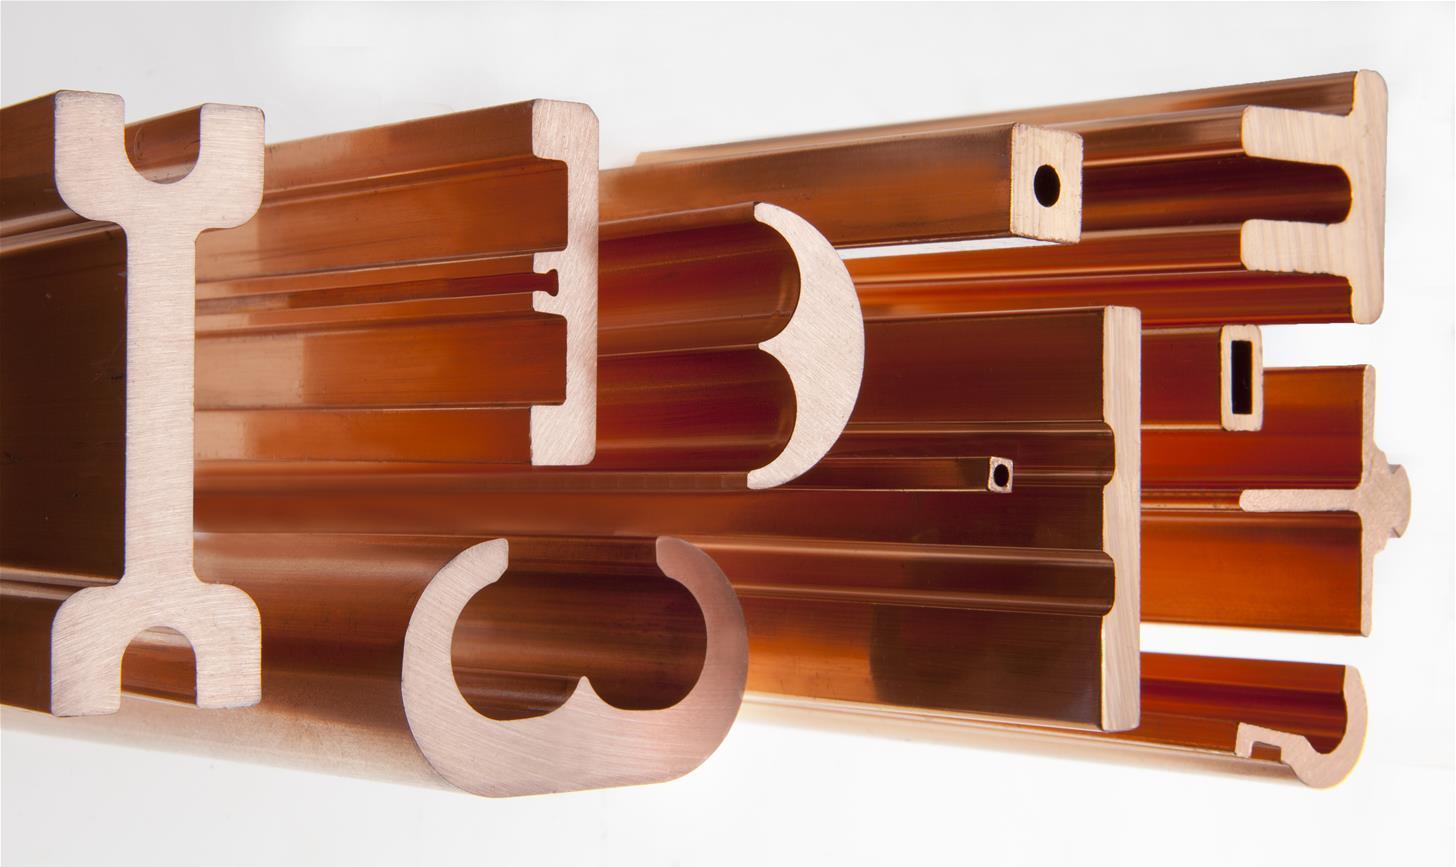 Several demanding copper profile shapes